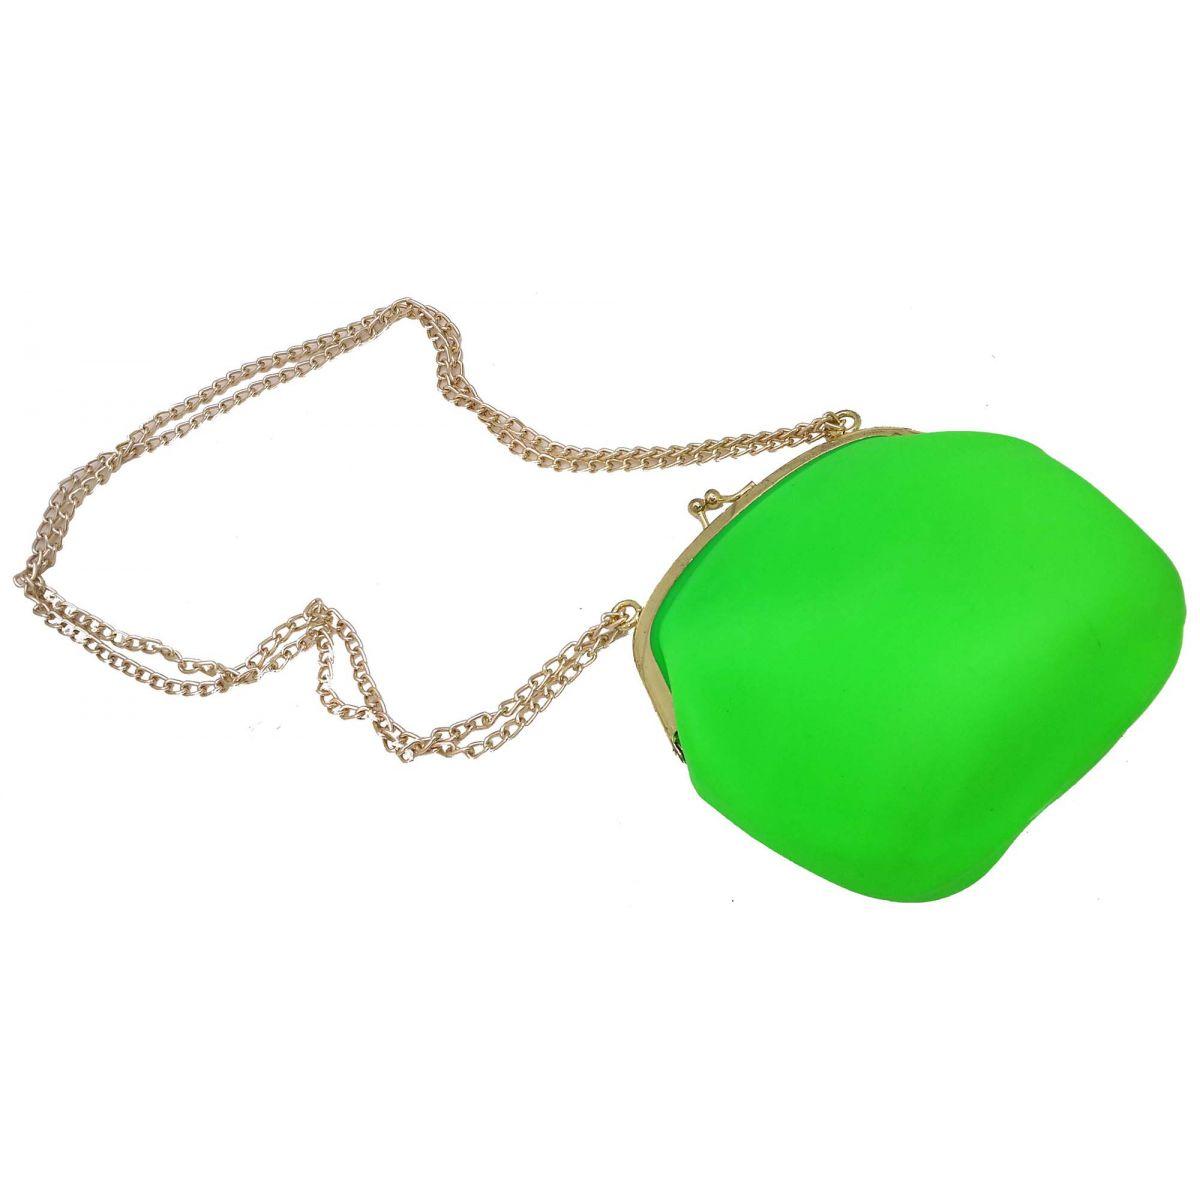 Bolsa Silicone Tiracolo Vintage Verde Com Corrente Dourada (BL-2662-6)